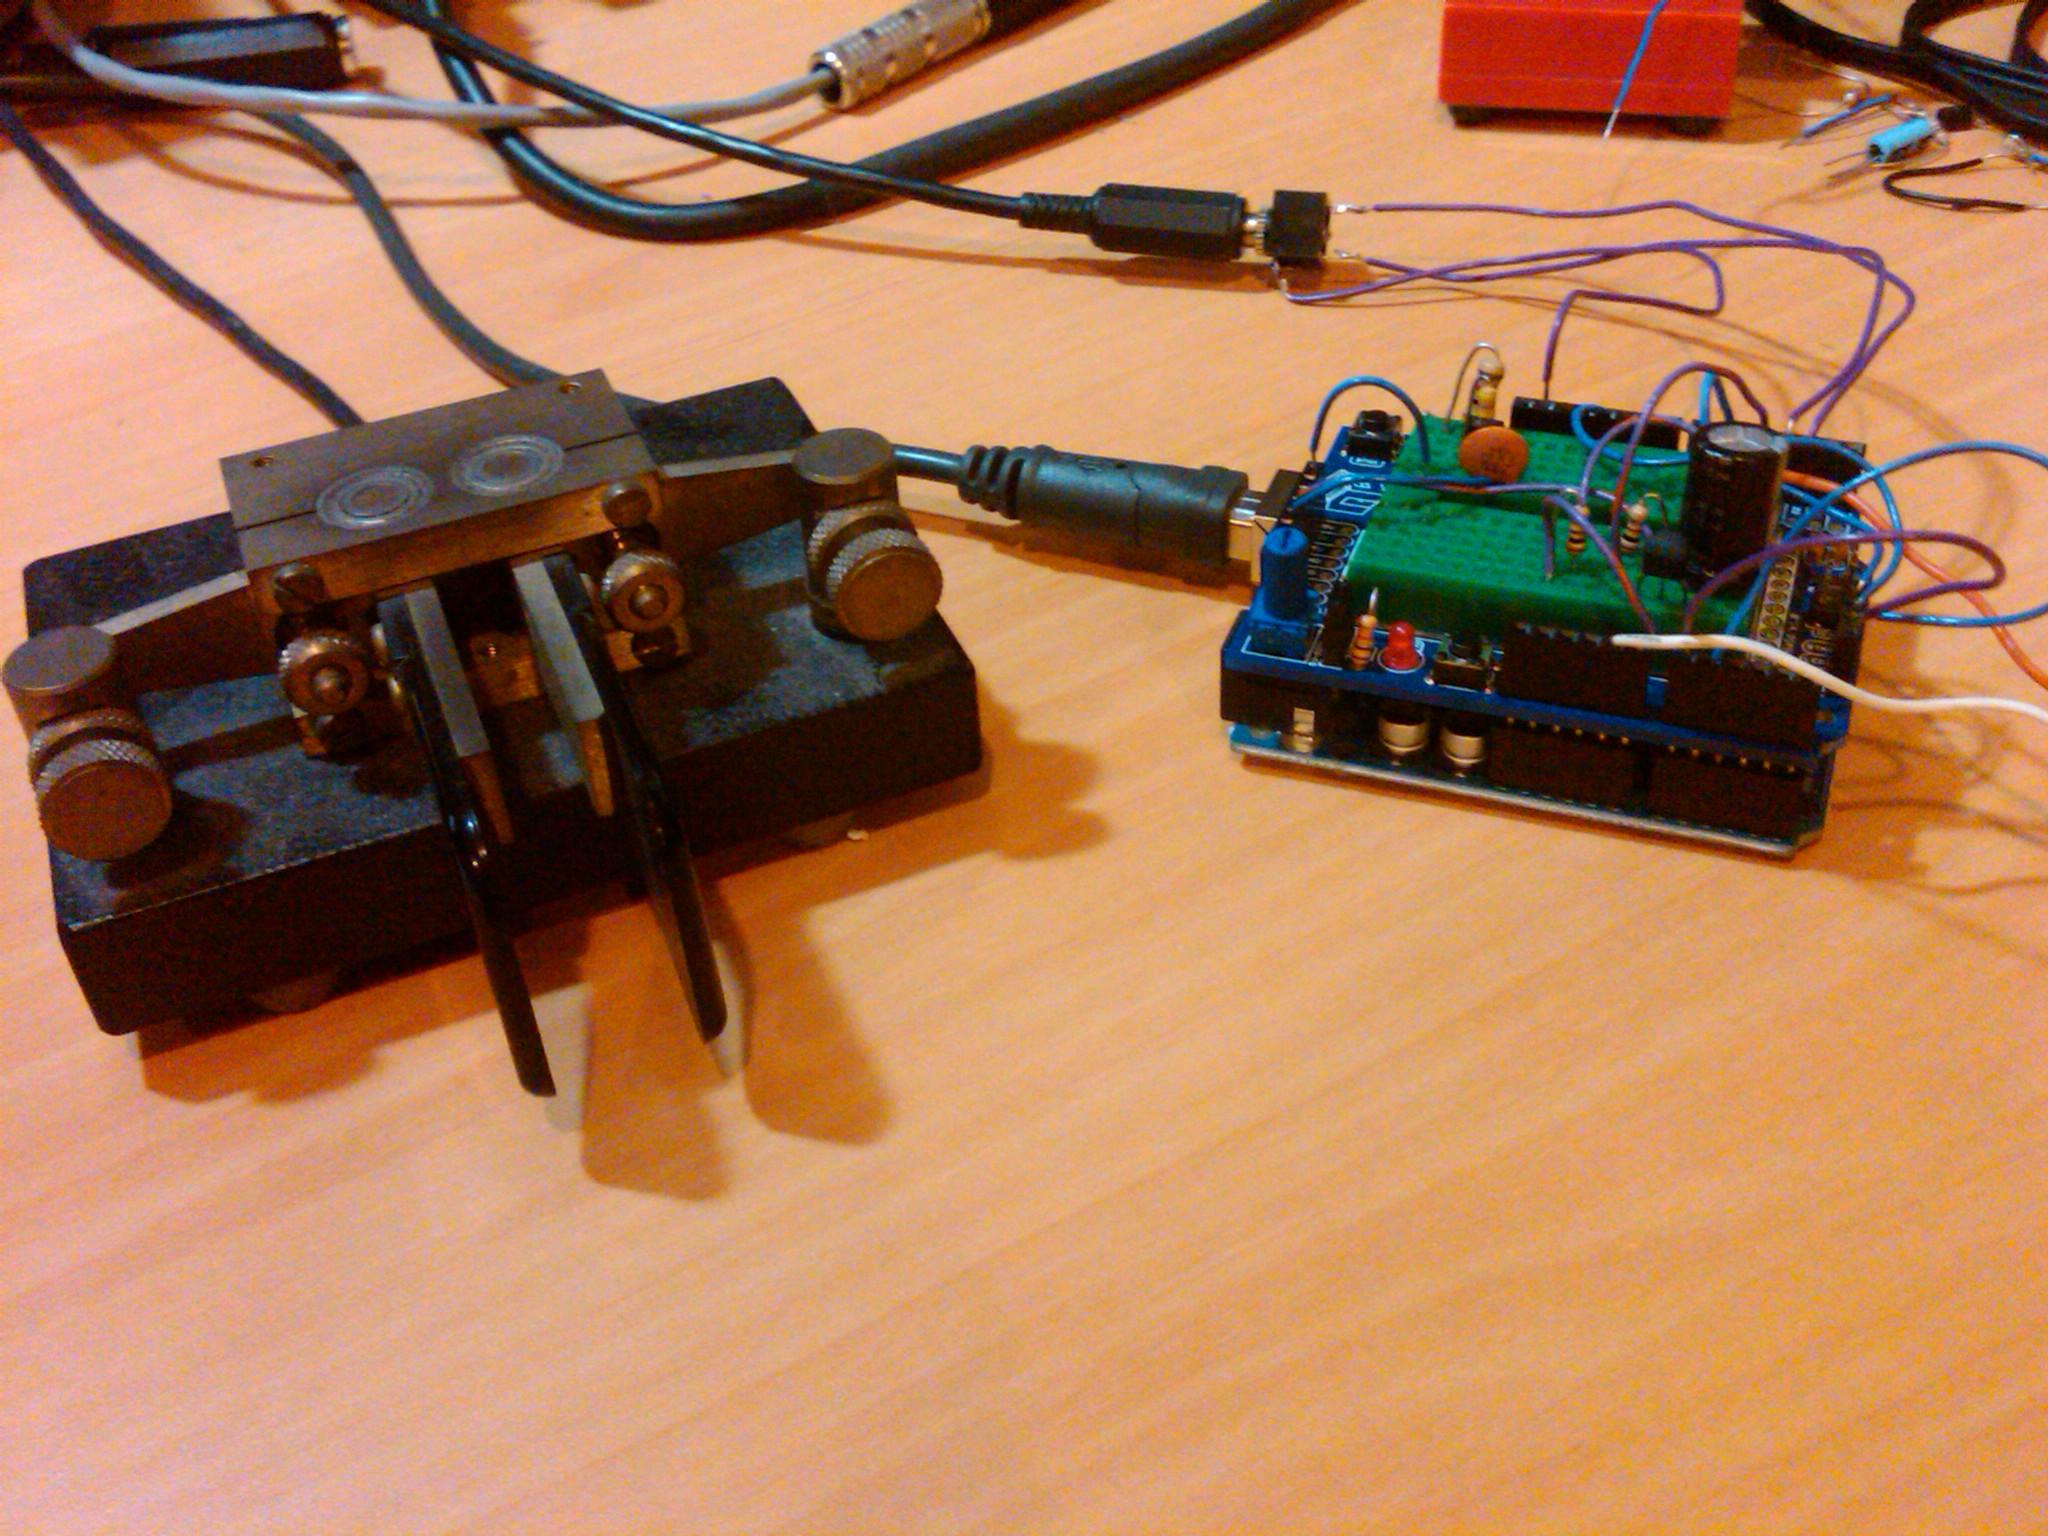 From The Workbench Arduino Cw Keyer Radio Artisan